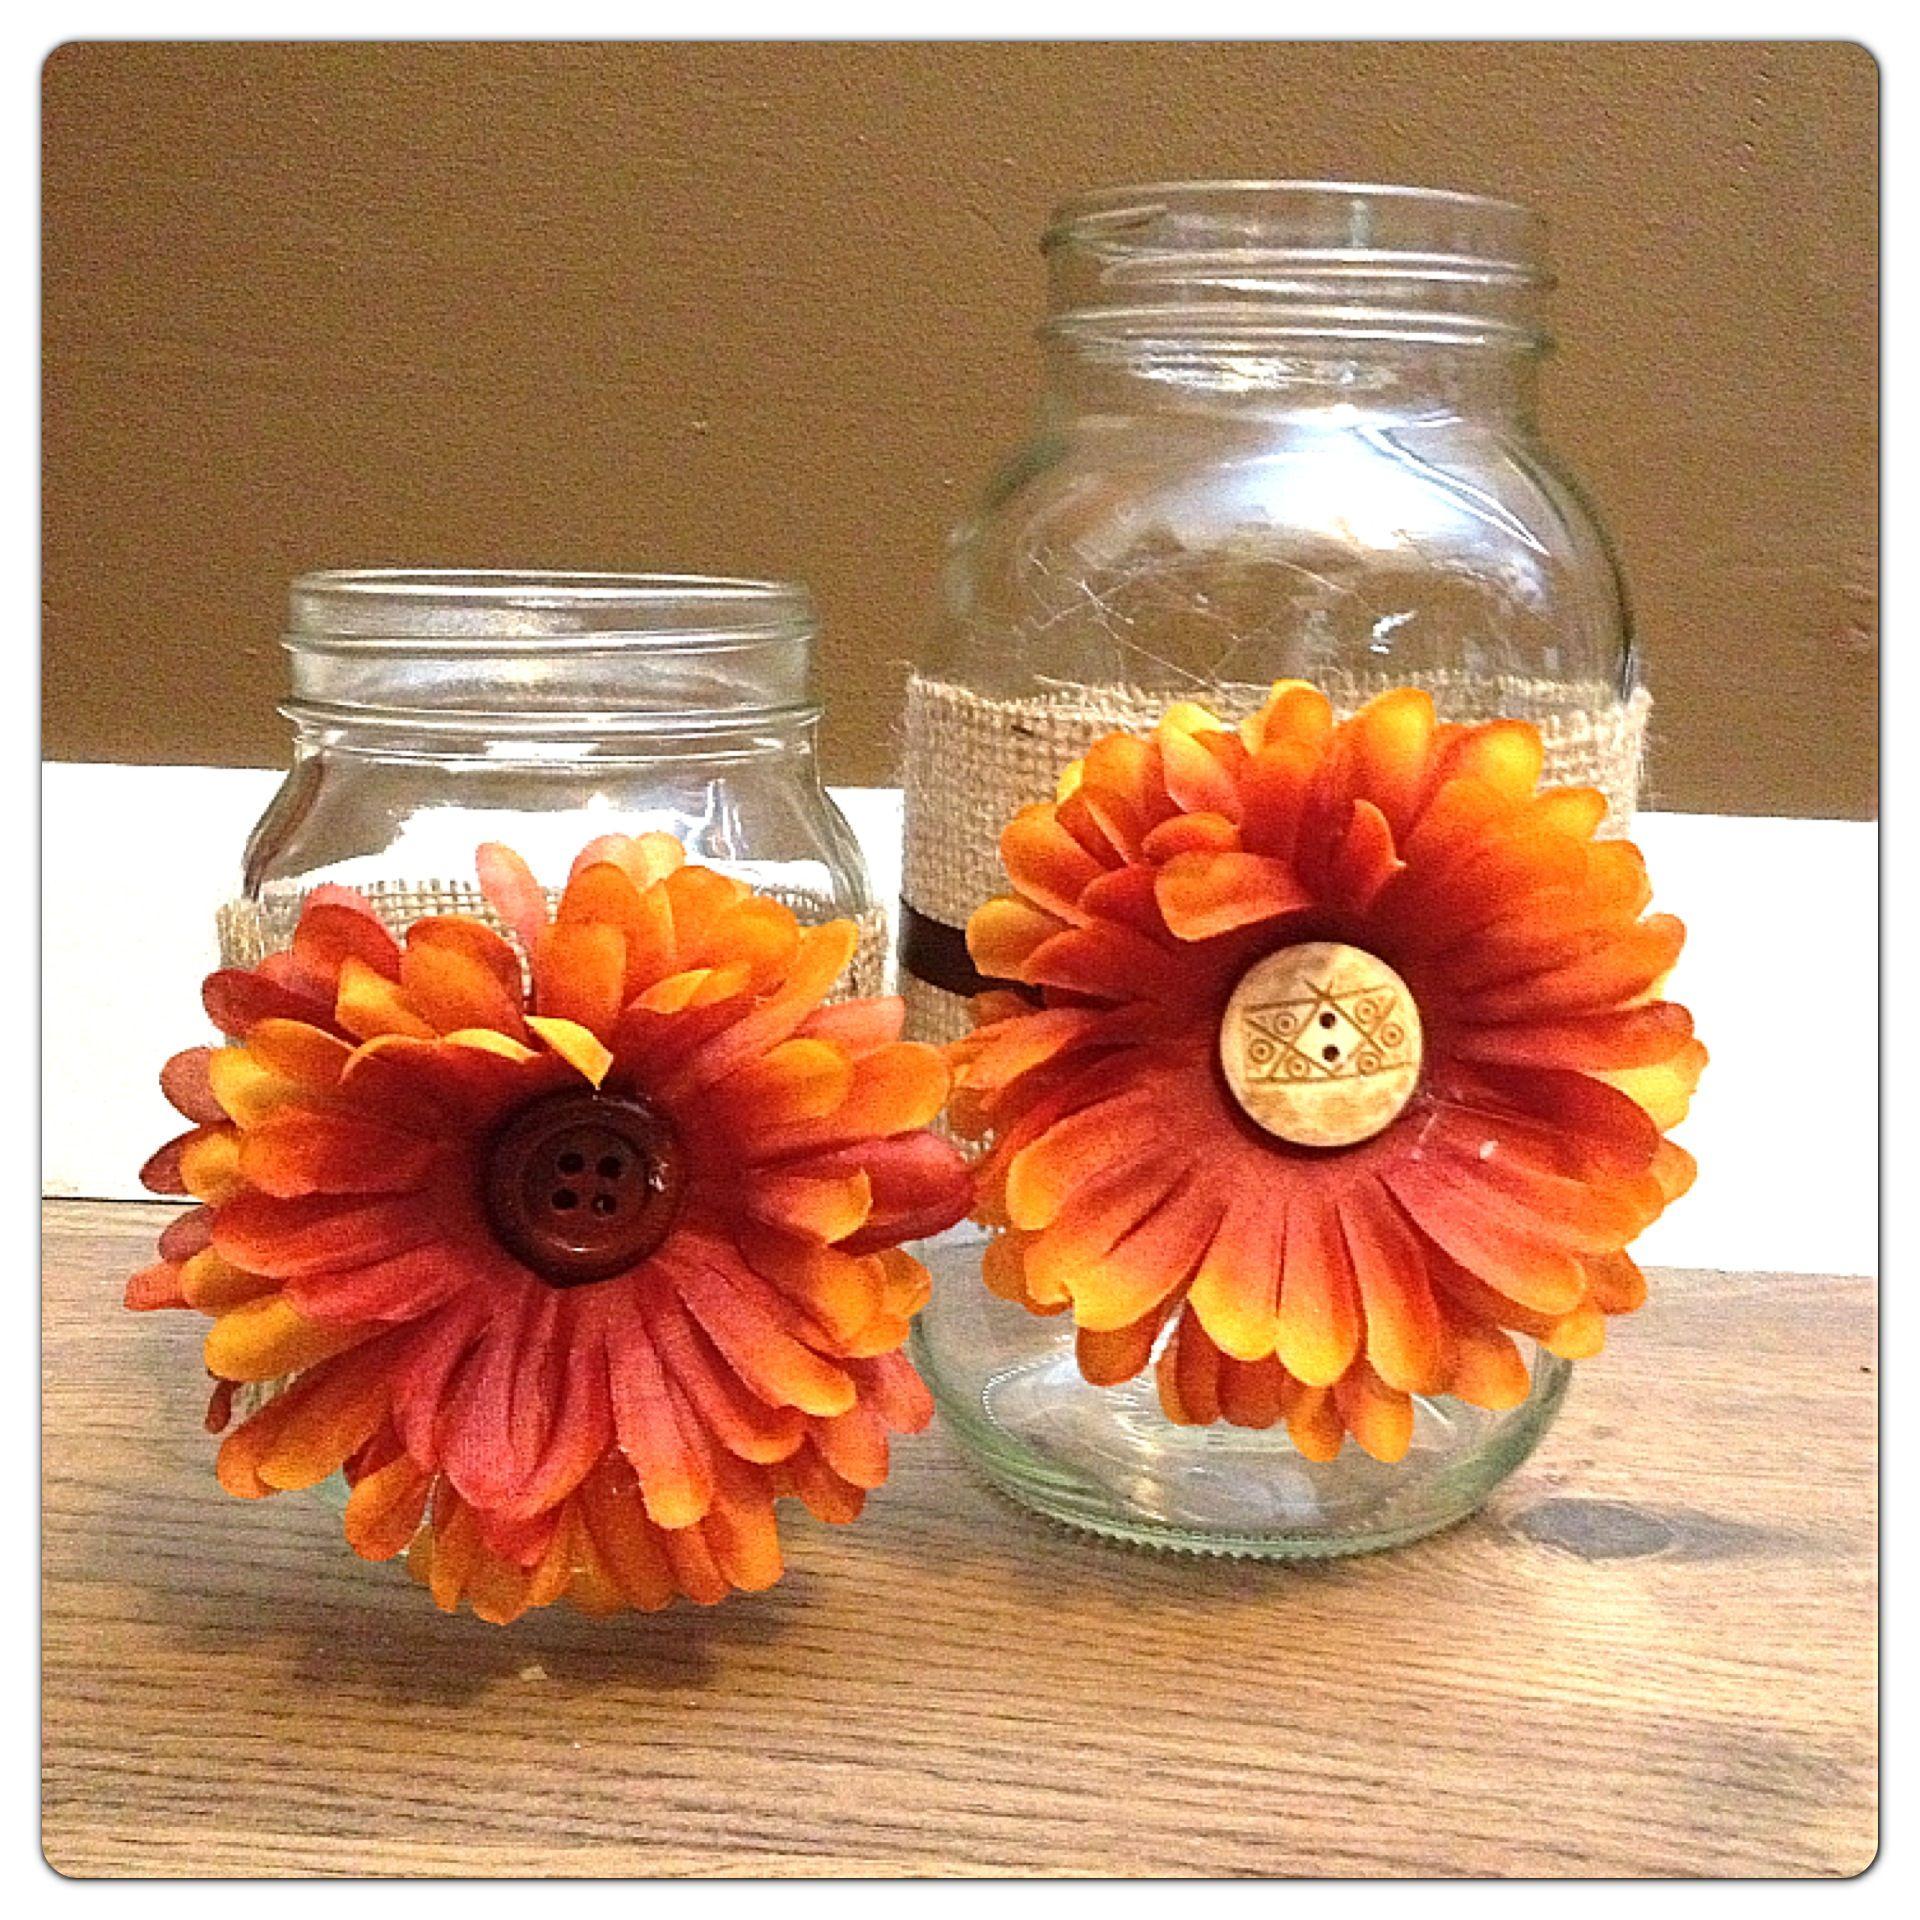 Fall bridal shower centerpieces wedding ideas someday